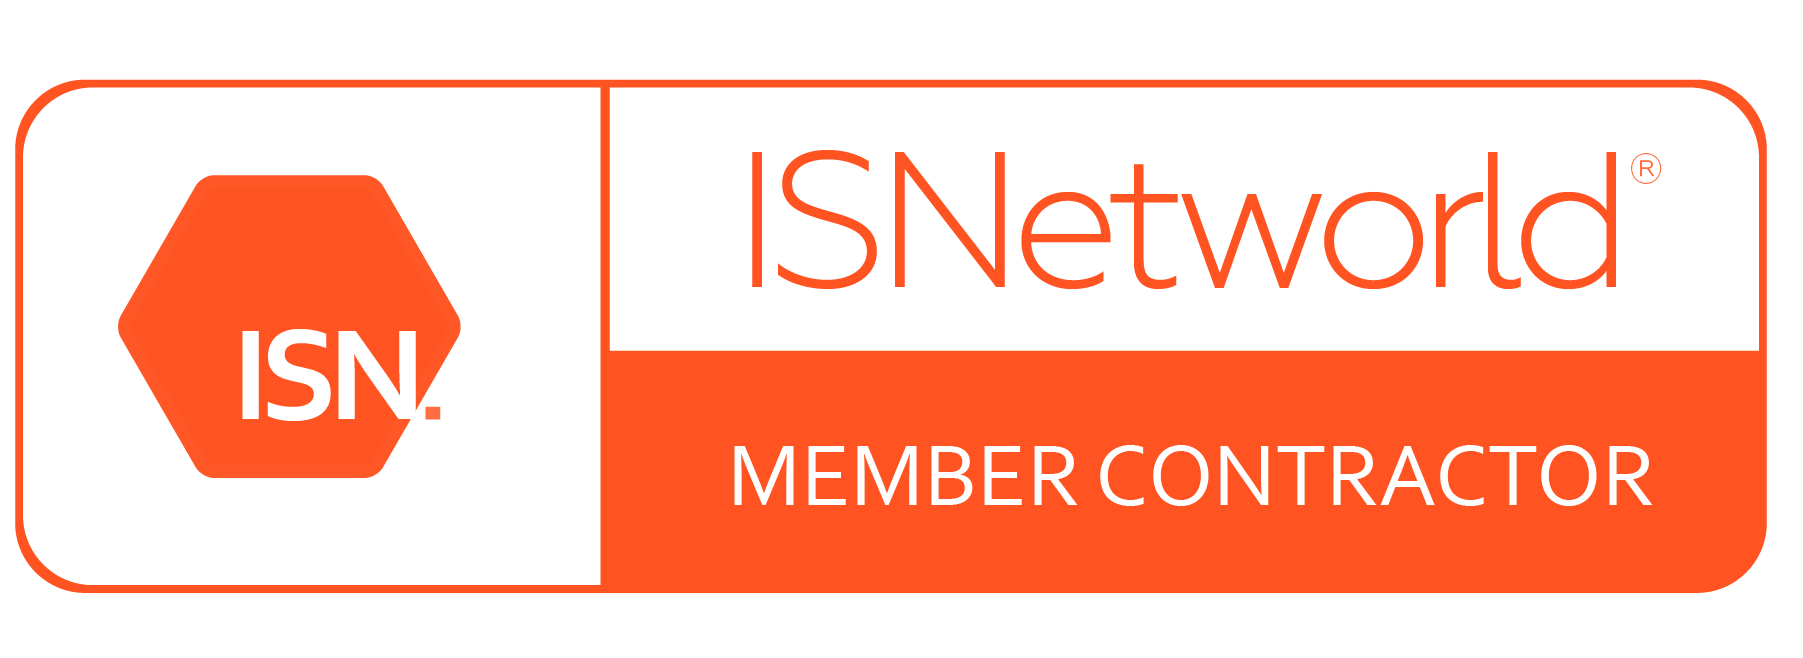 ISNetwork